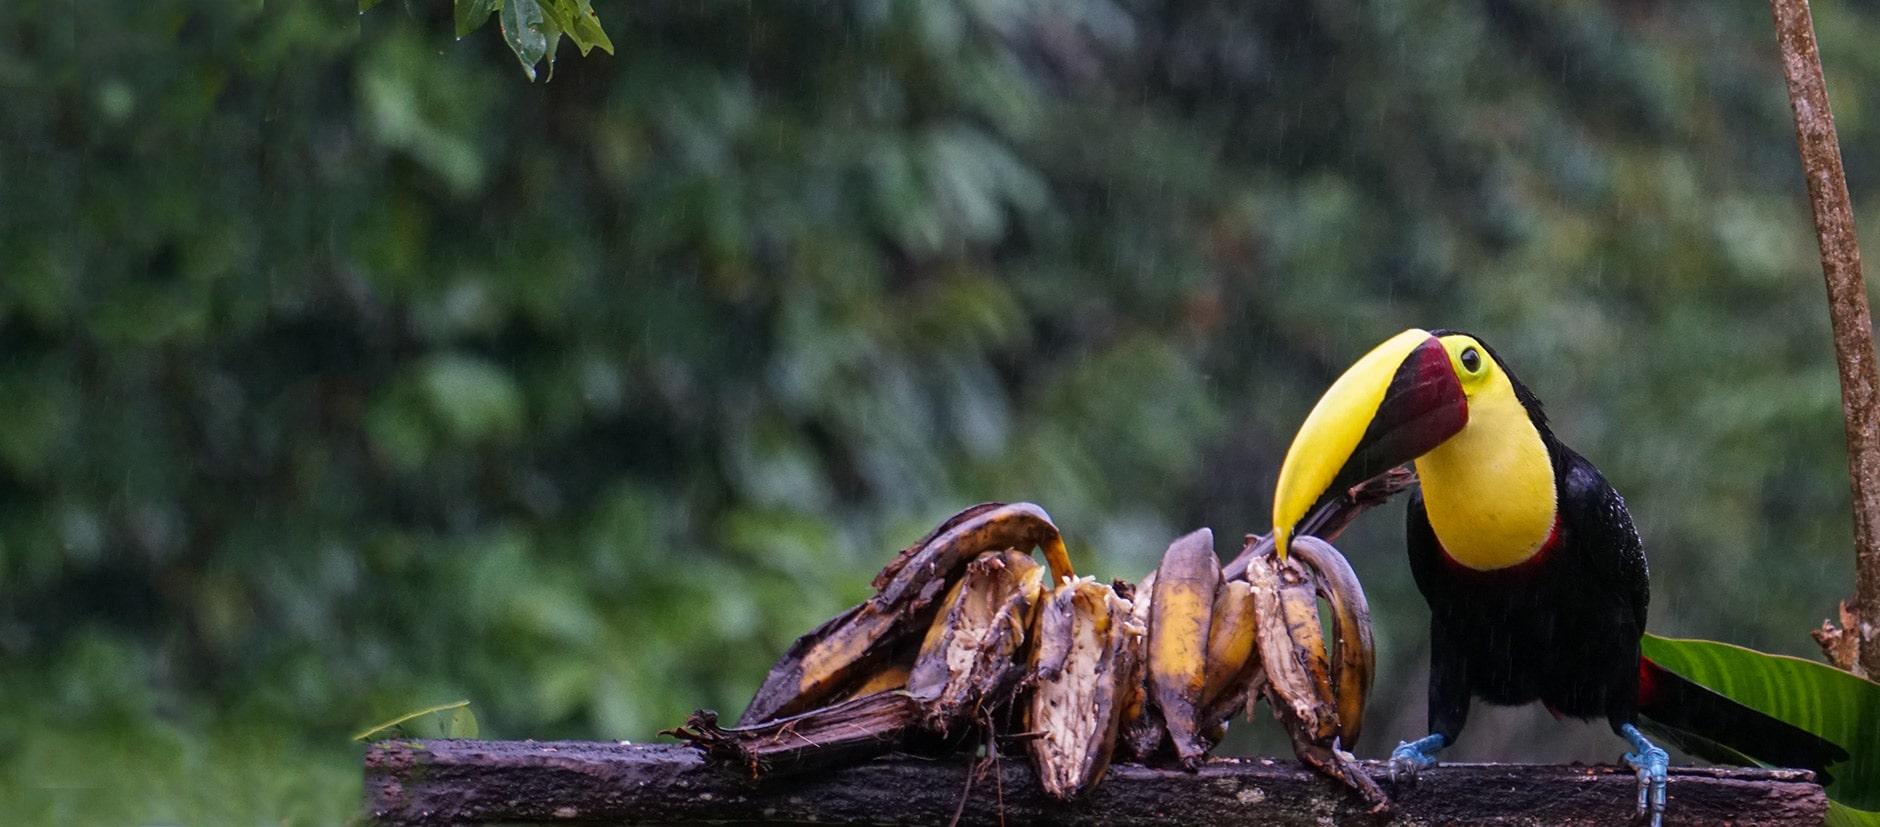 ellow-throated toucan in Posada Cielo Roto